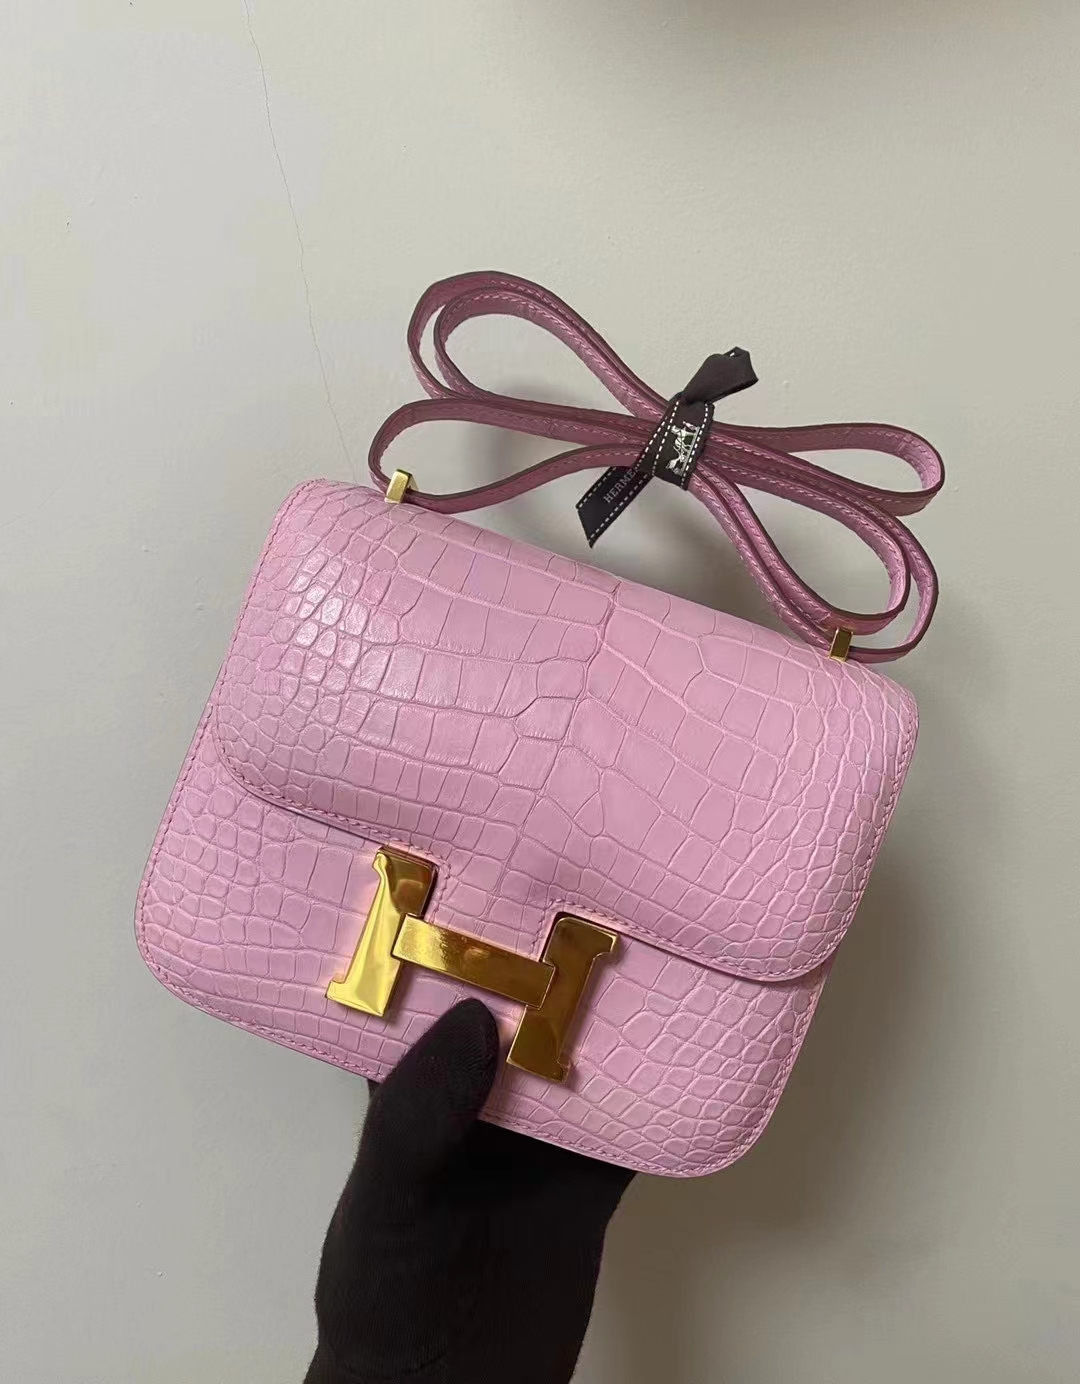 Hermès(爱马仕)constance 空姐包 雾面鳄鱼 樱花粉 3p 金扣 19cm 顶级纯手工 现货